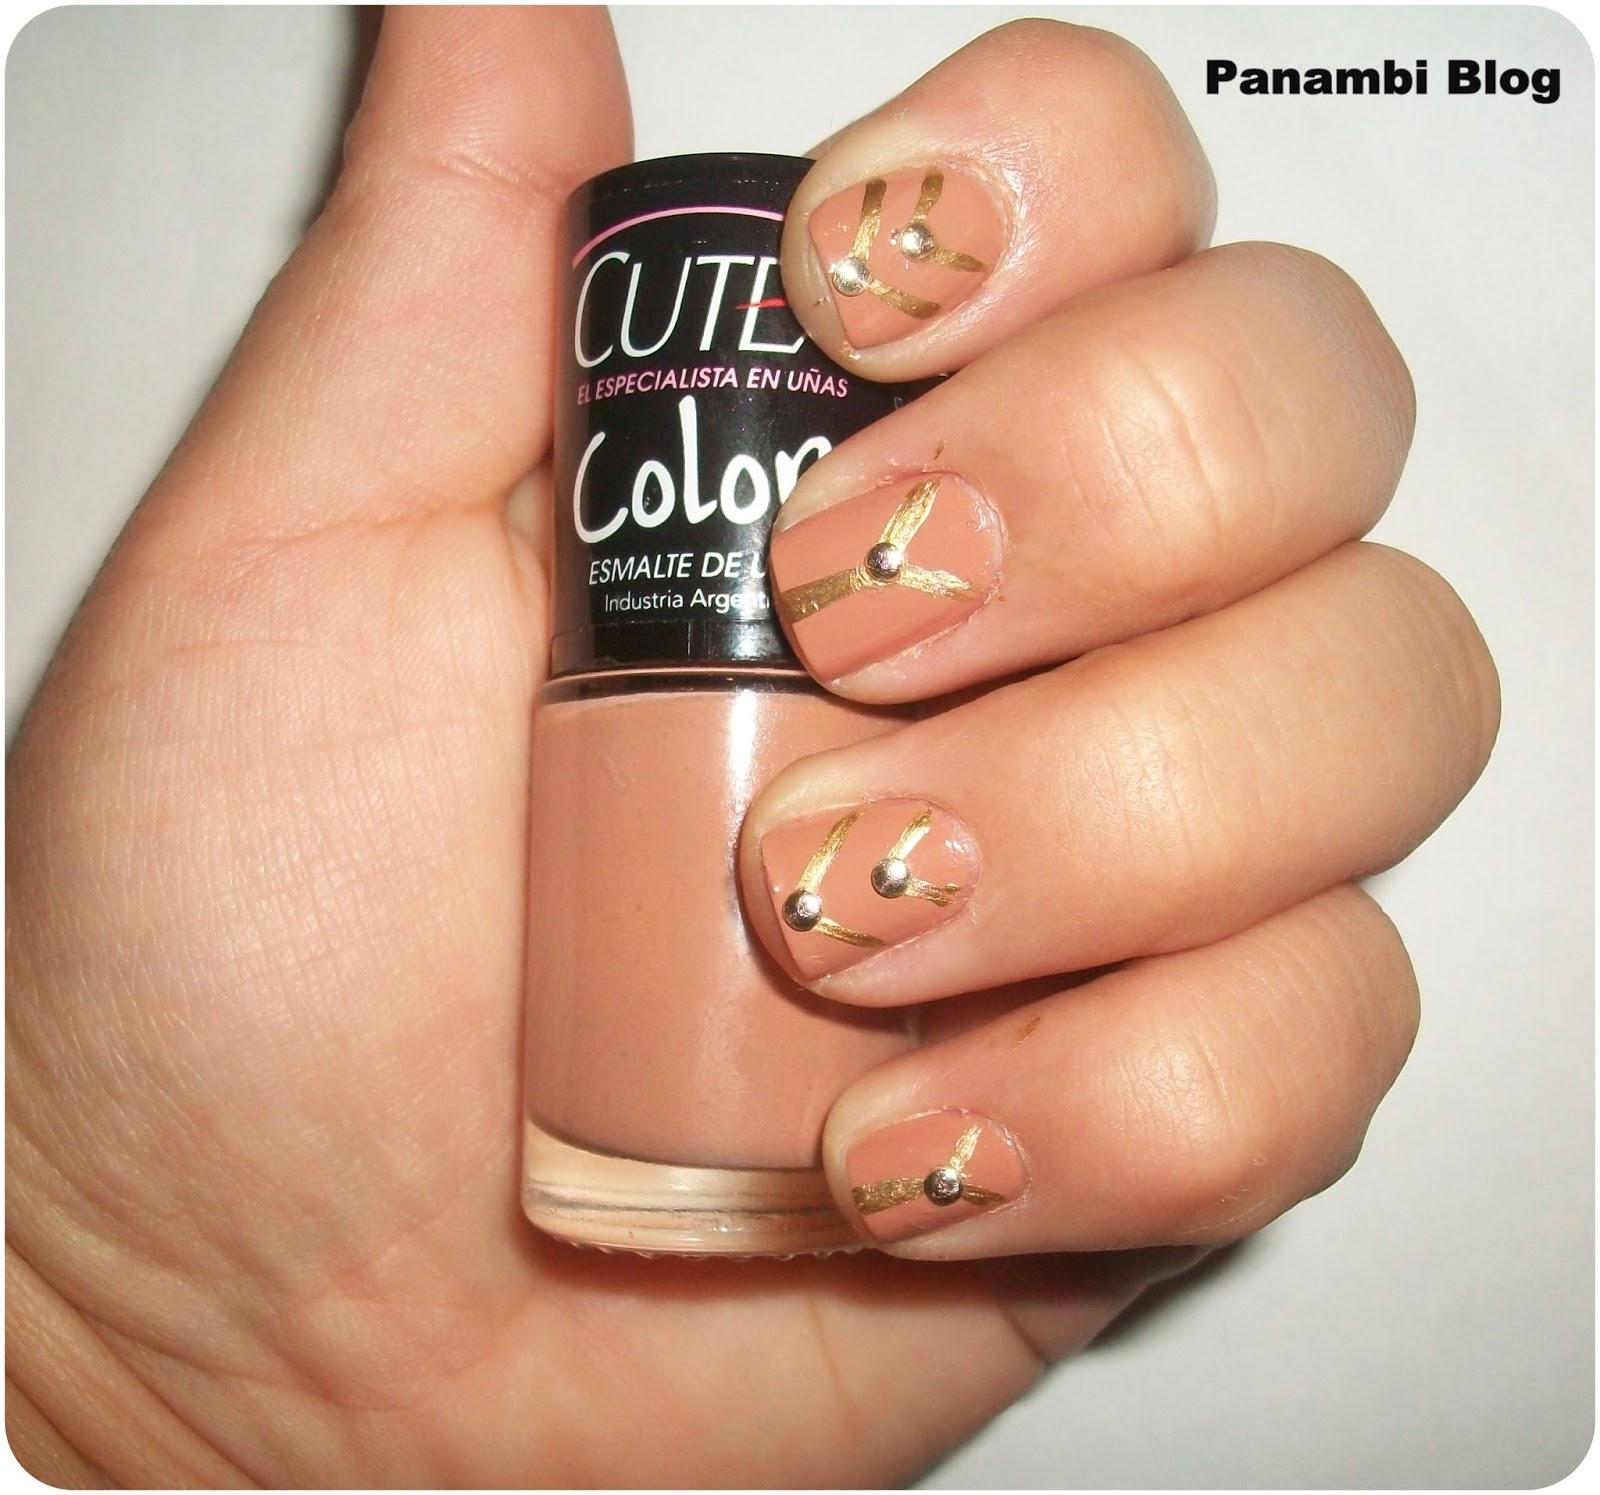 Panambi Blog: Mon Amour - Cutex.